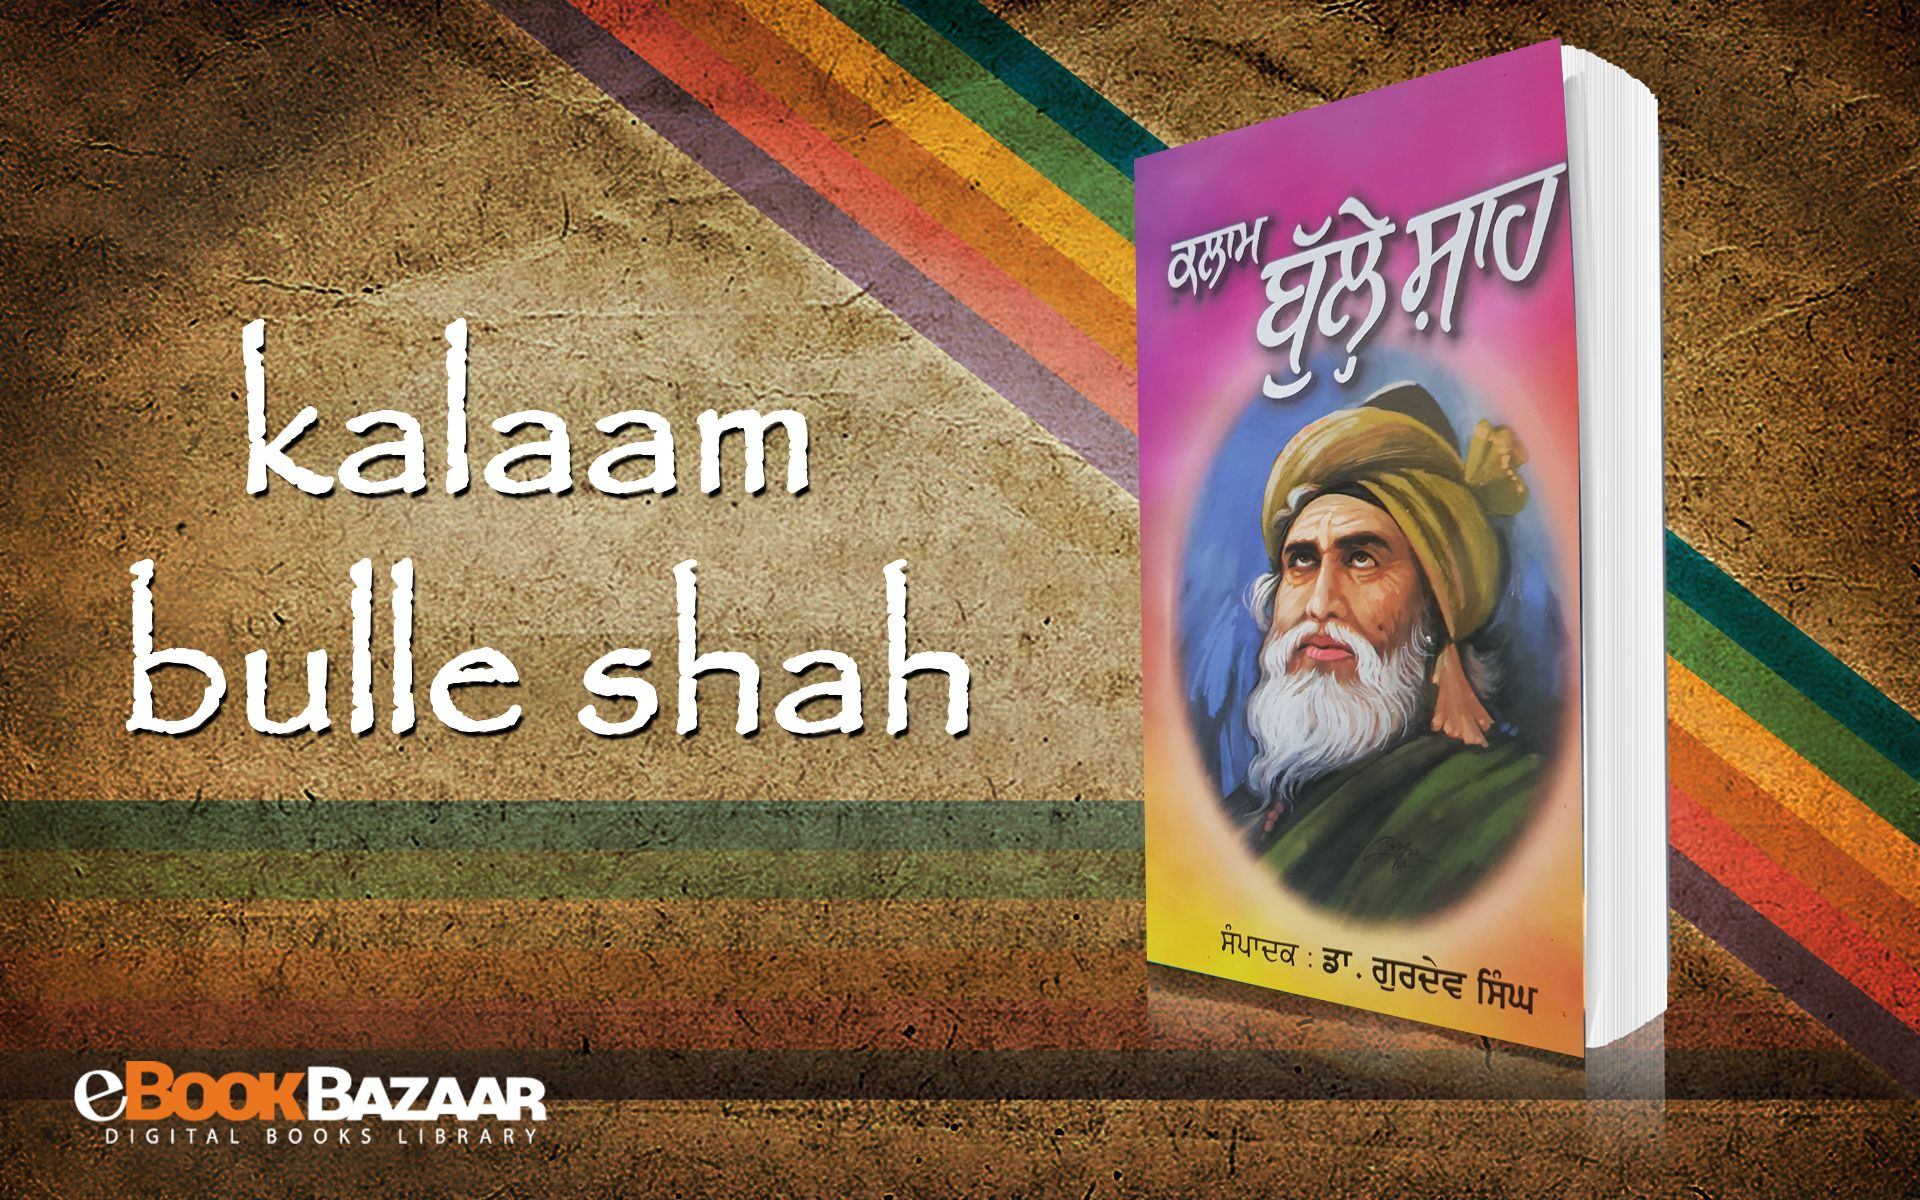 Pin On Read Online History Books Ebookbazaar How to read punjabi novels online